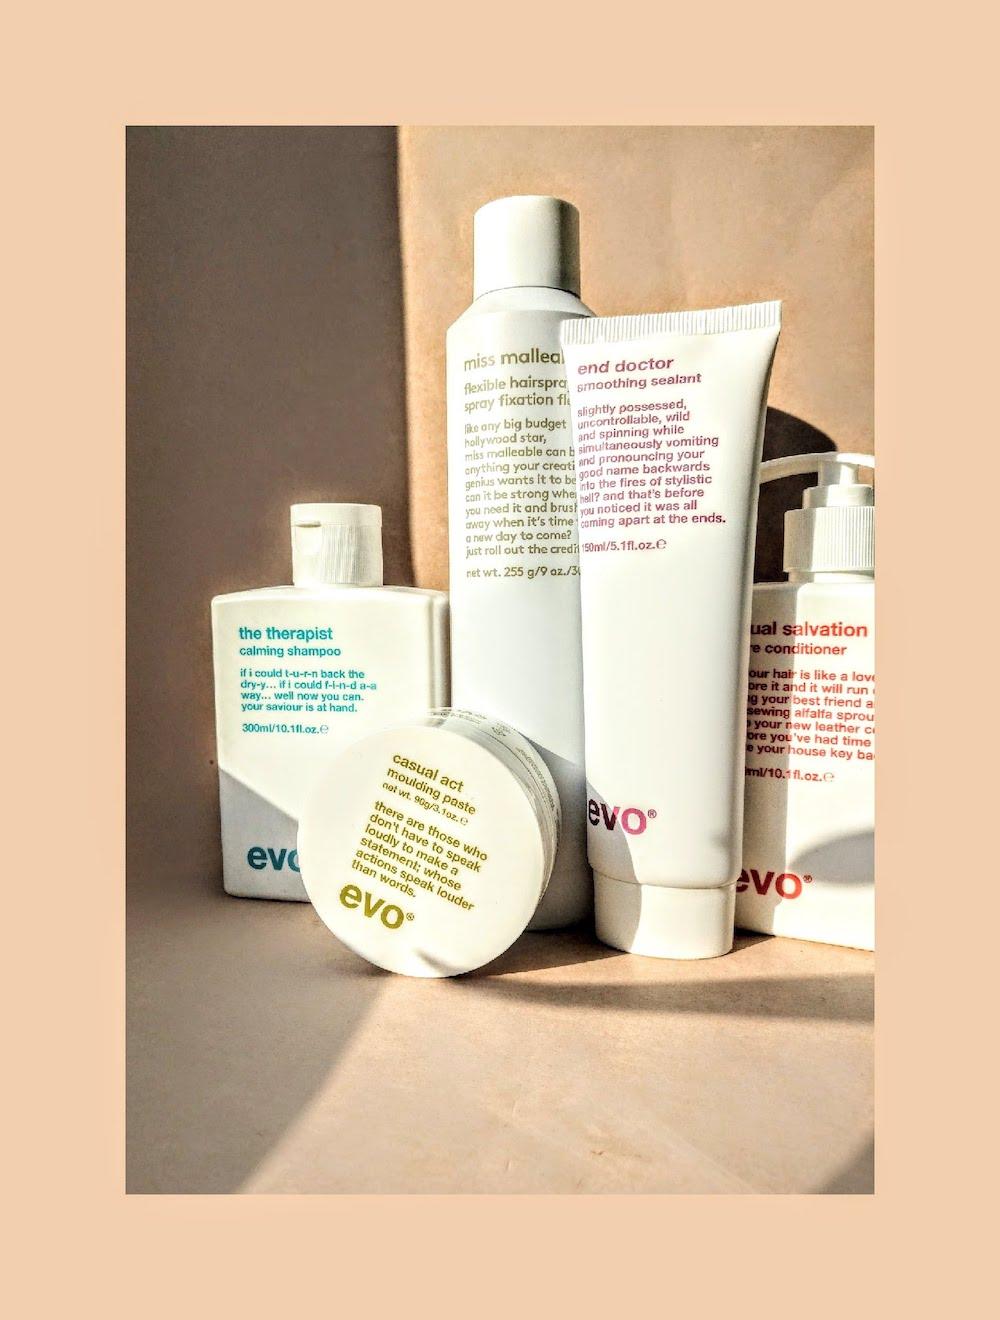 Beautyblog Beautyblogger BARE MINDS Elina Neumann Veronika stilblut Haircare Evo